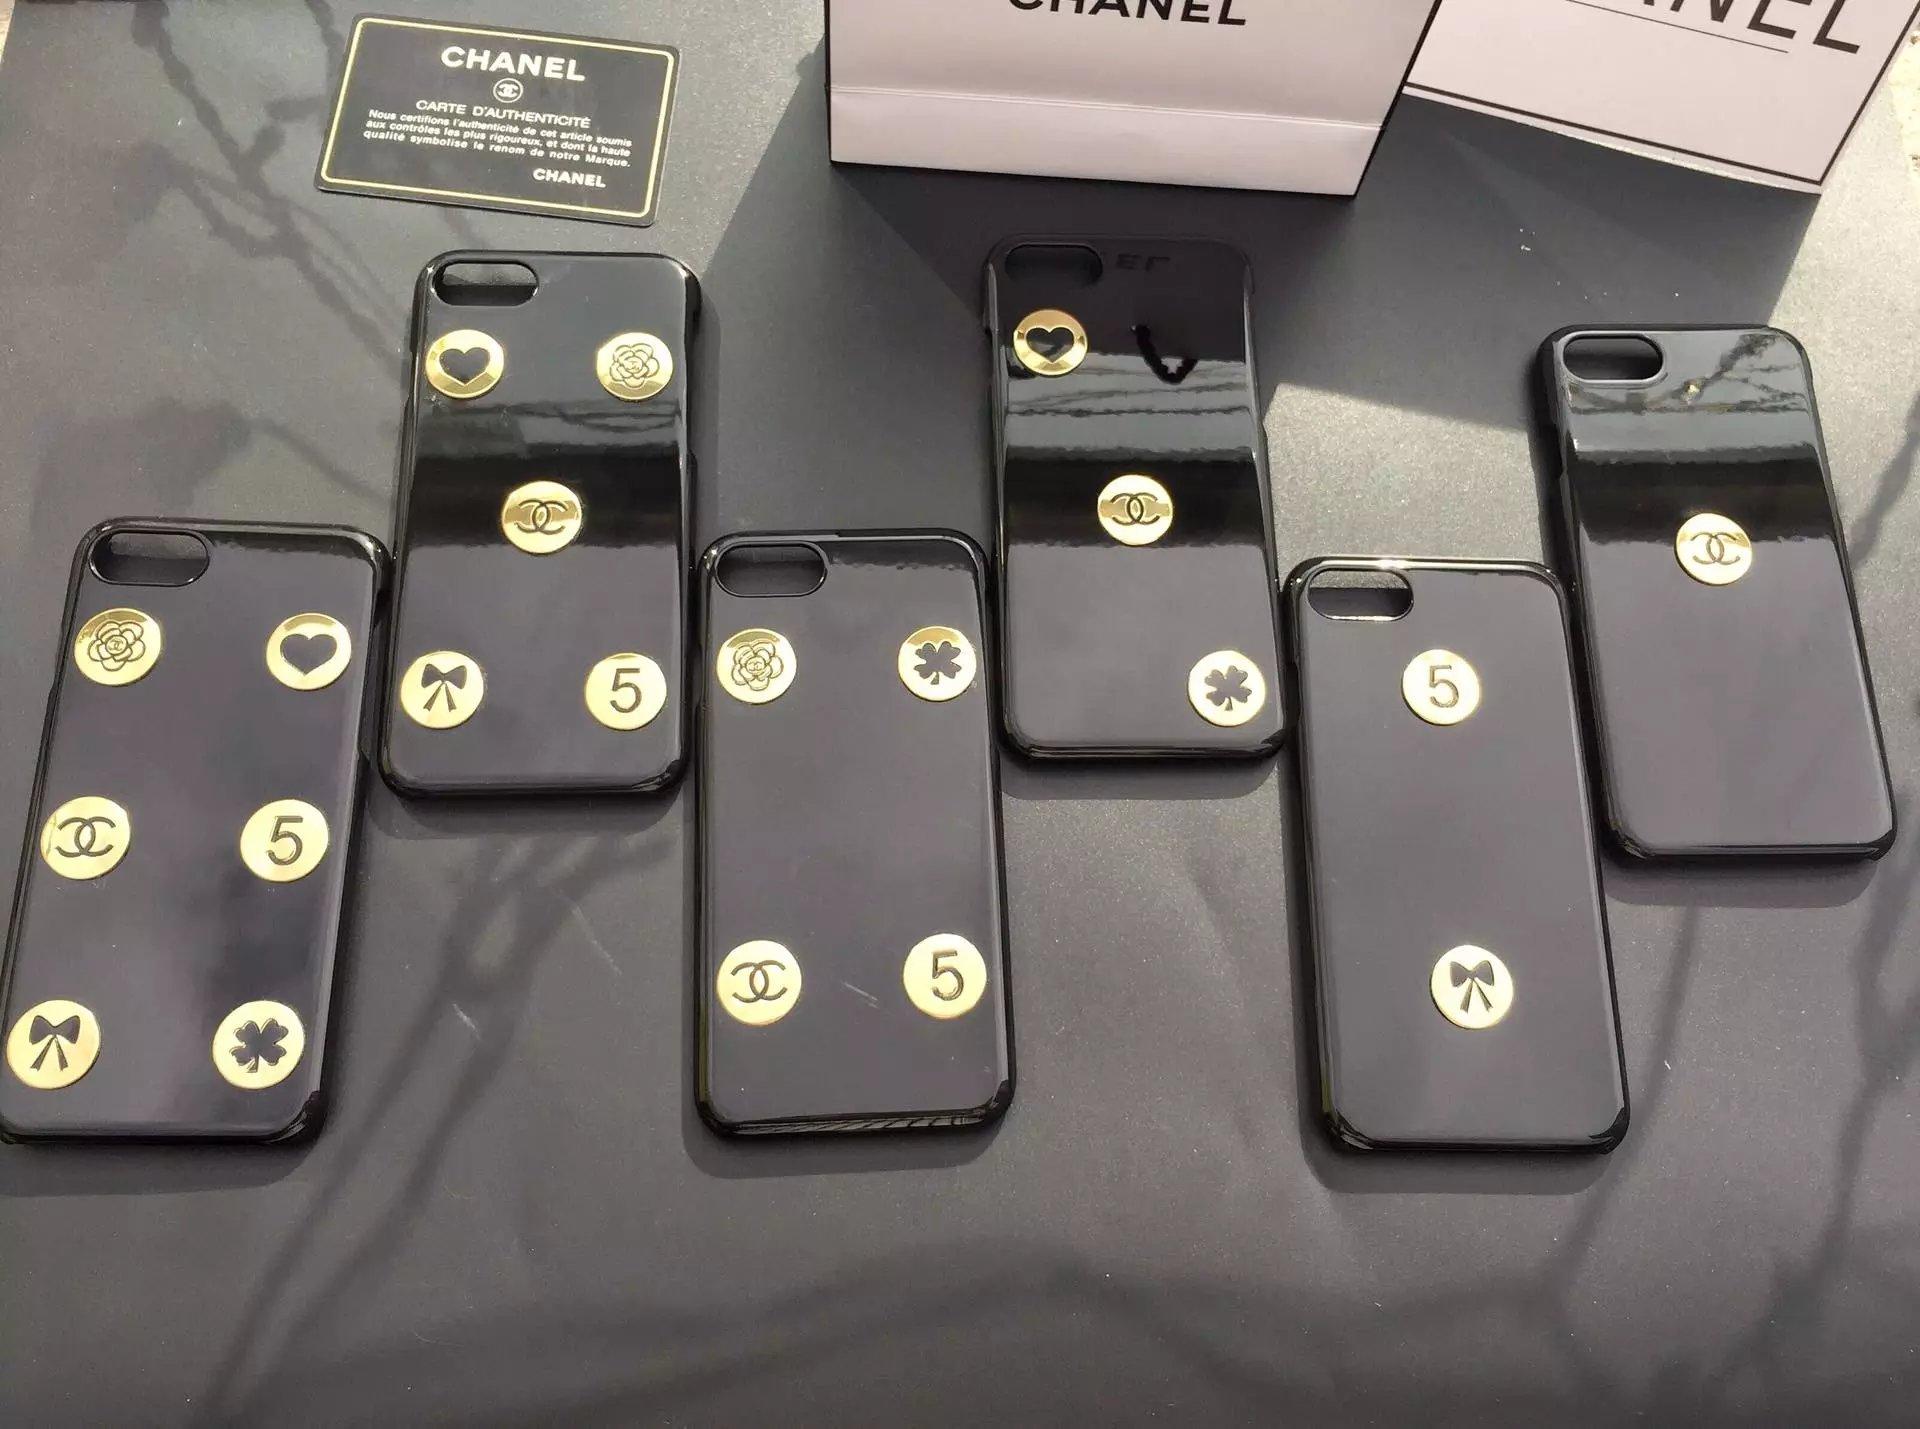 8 cover iphone best phone case for iphone 8 Chanel iphone 8 case cooler master elite 661 plus black iphone 8 designer batteries pluss latest phone cases leather cell phone covers best iphone 8 phone cases